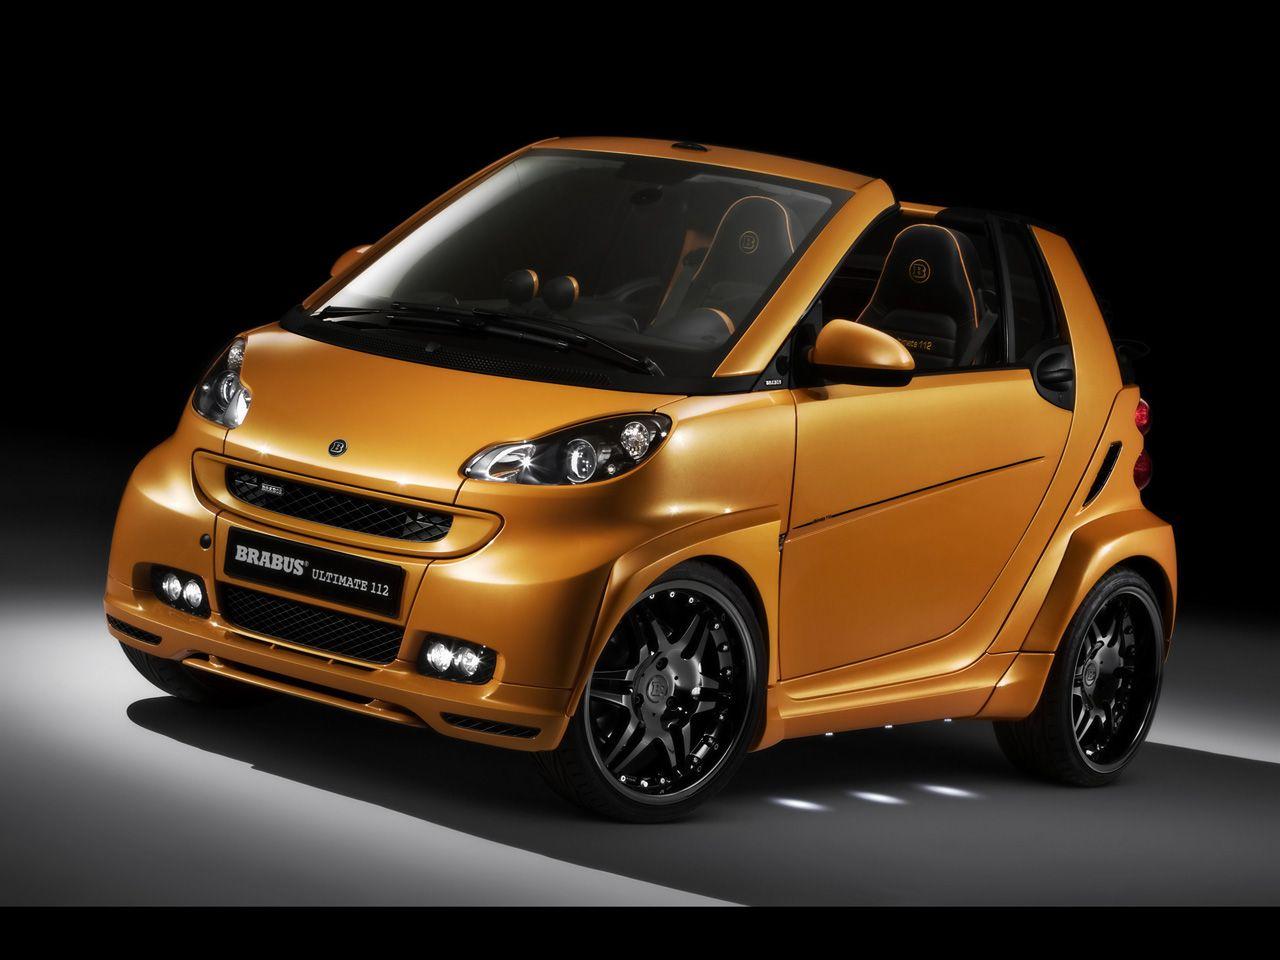 Smart Car Body Kits Brabus Smart Fortwo Ultimate 112